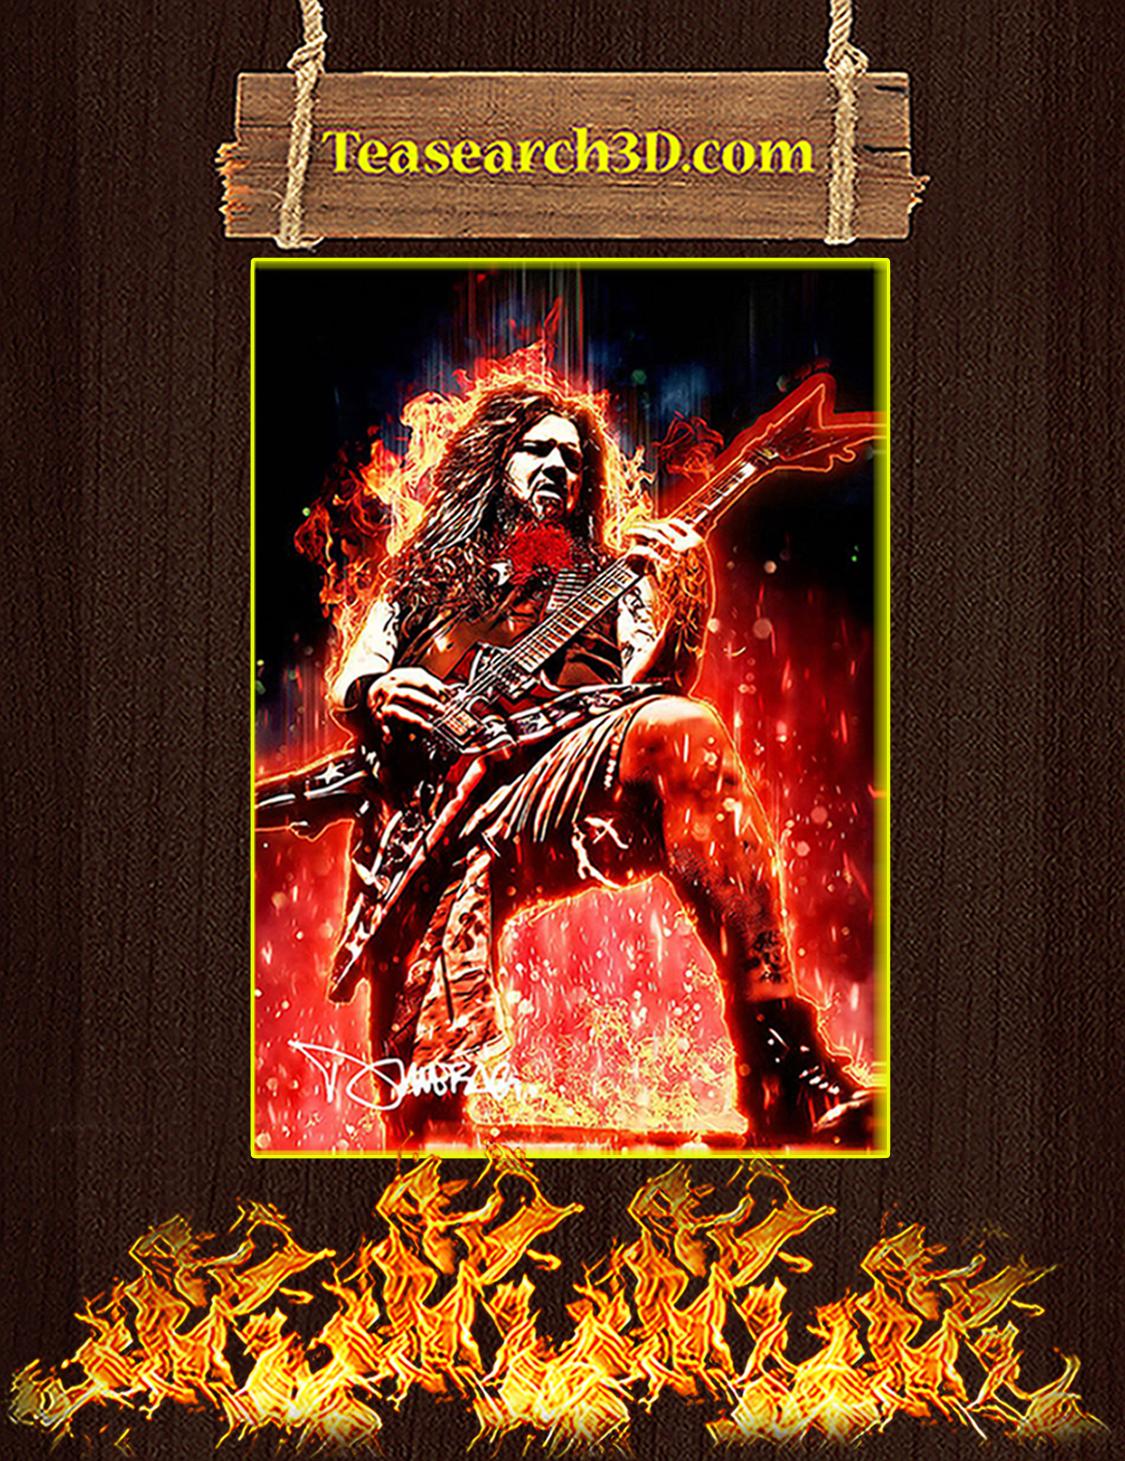 Legendary Dimebag Darrell Signature Poster A3